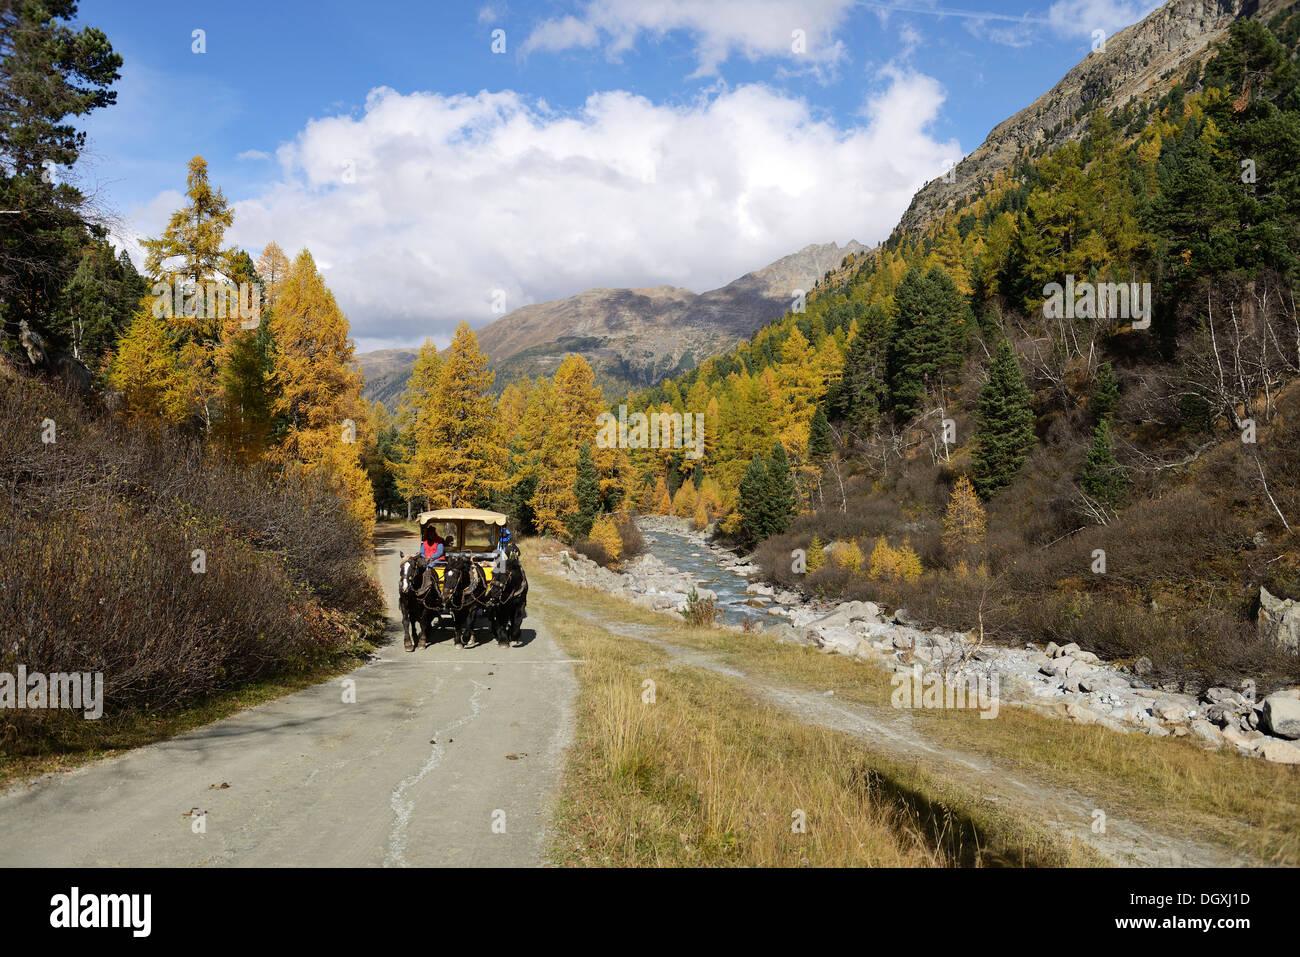 Horse-drawn carriage, Roseg valley, landscape in autumn, Pontresina, canton of Grisons, Engadin, Switzerland, Europe - Stock Image